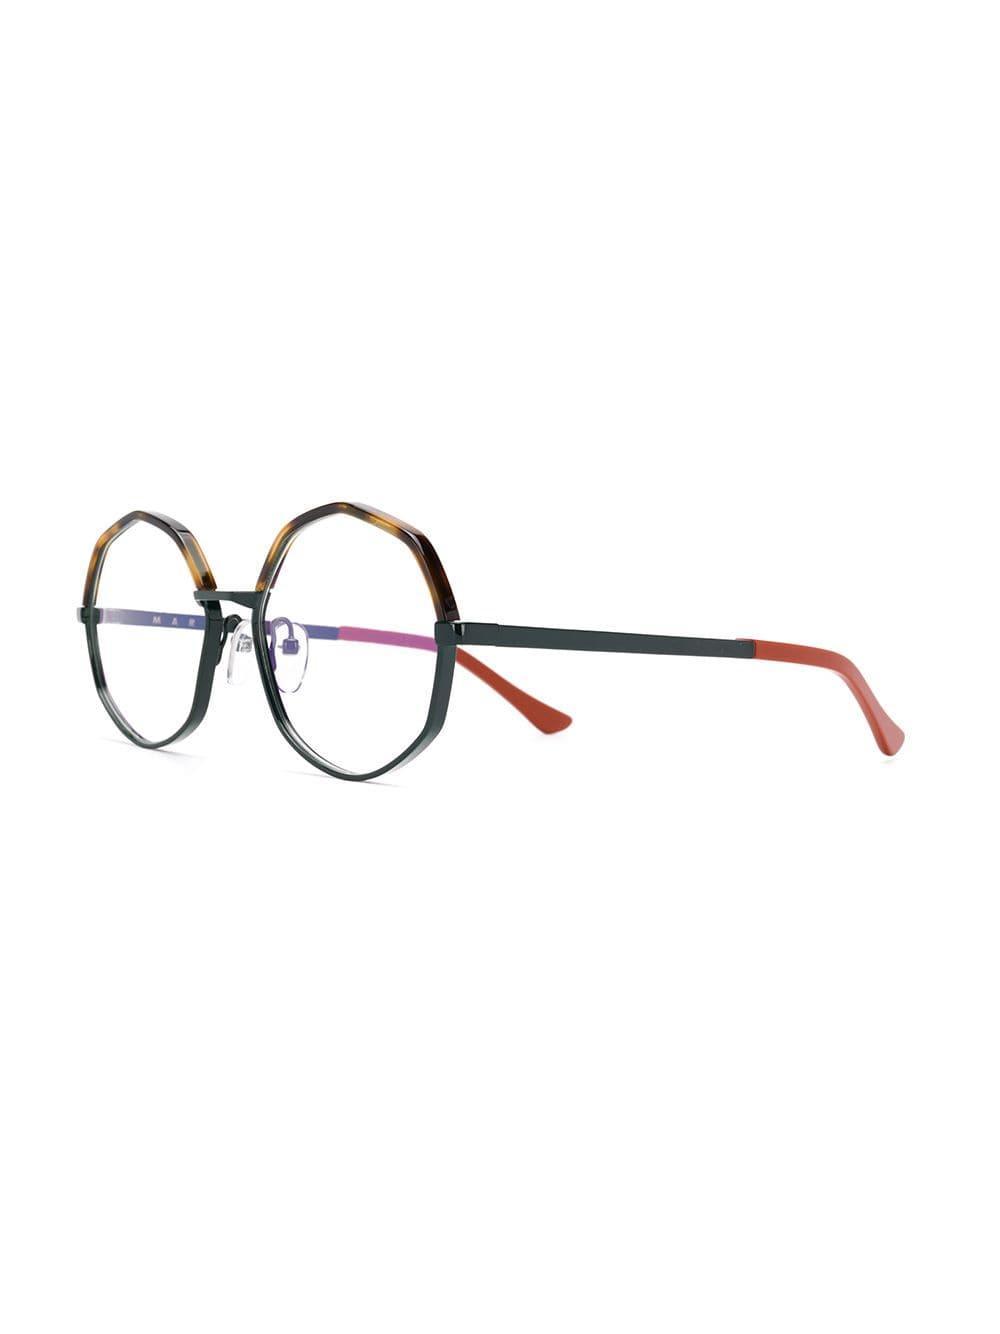 82f2da1a62d Lyst - Marni Eyewear Geometric-frame Glasses in Orange